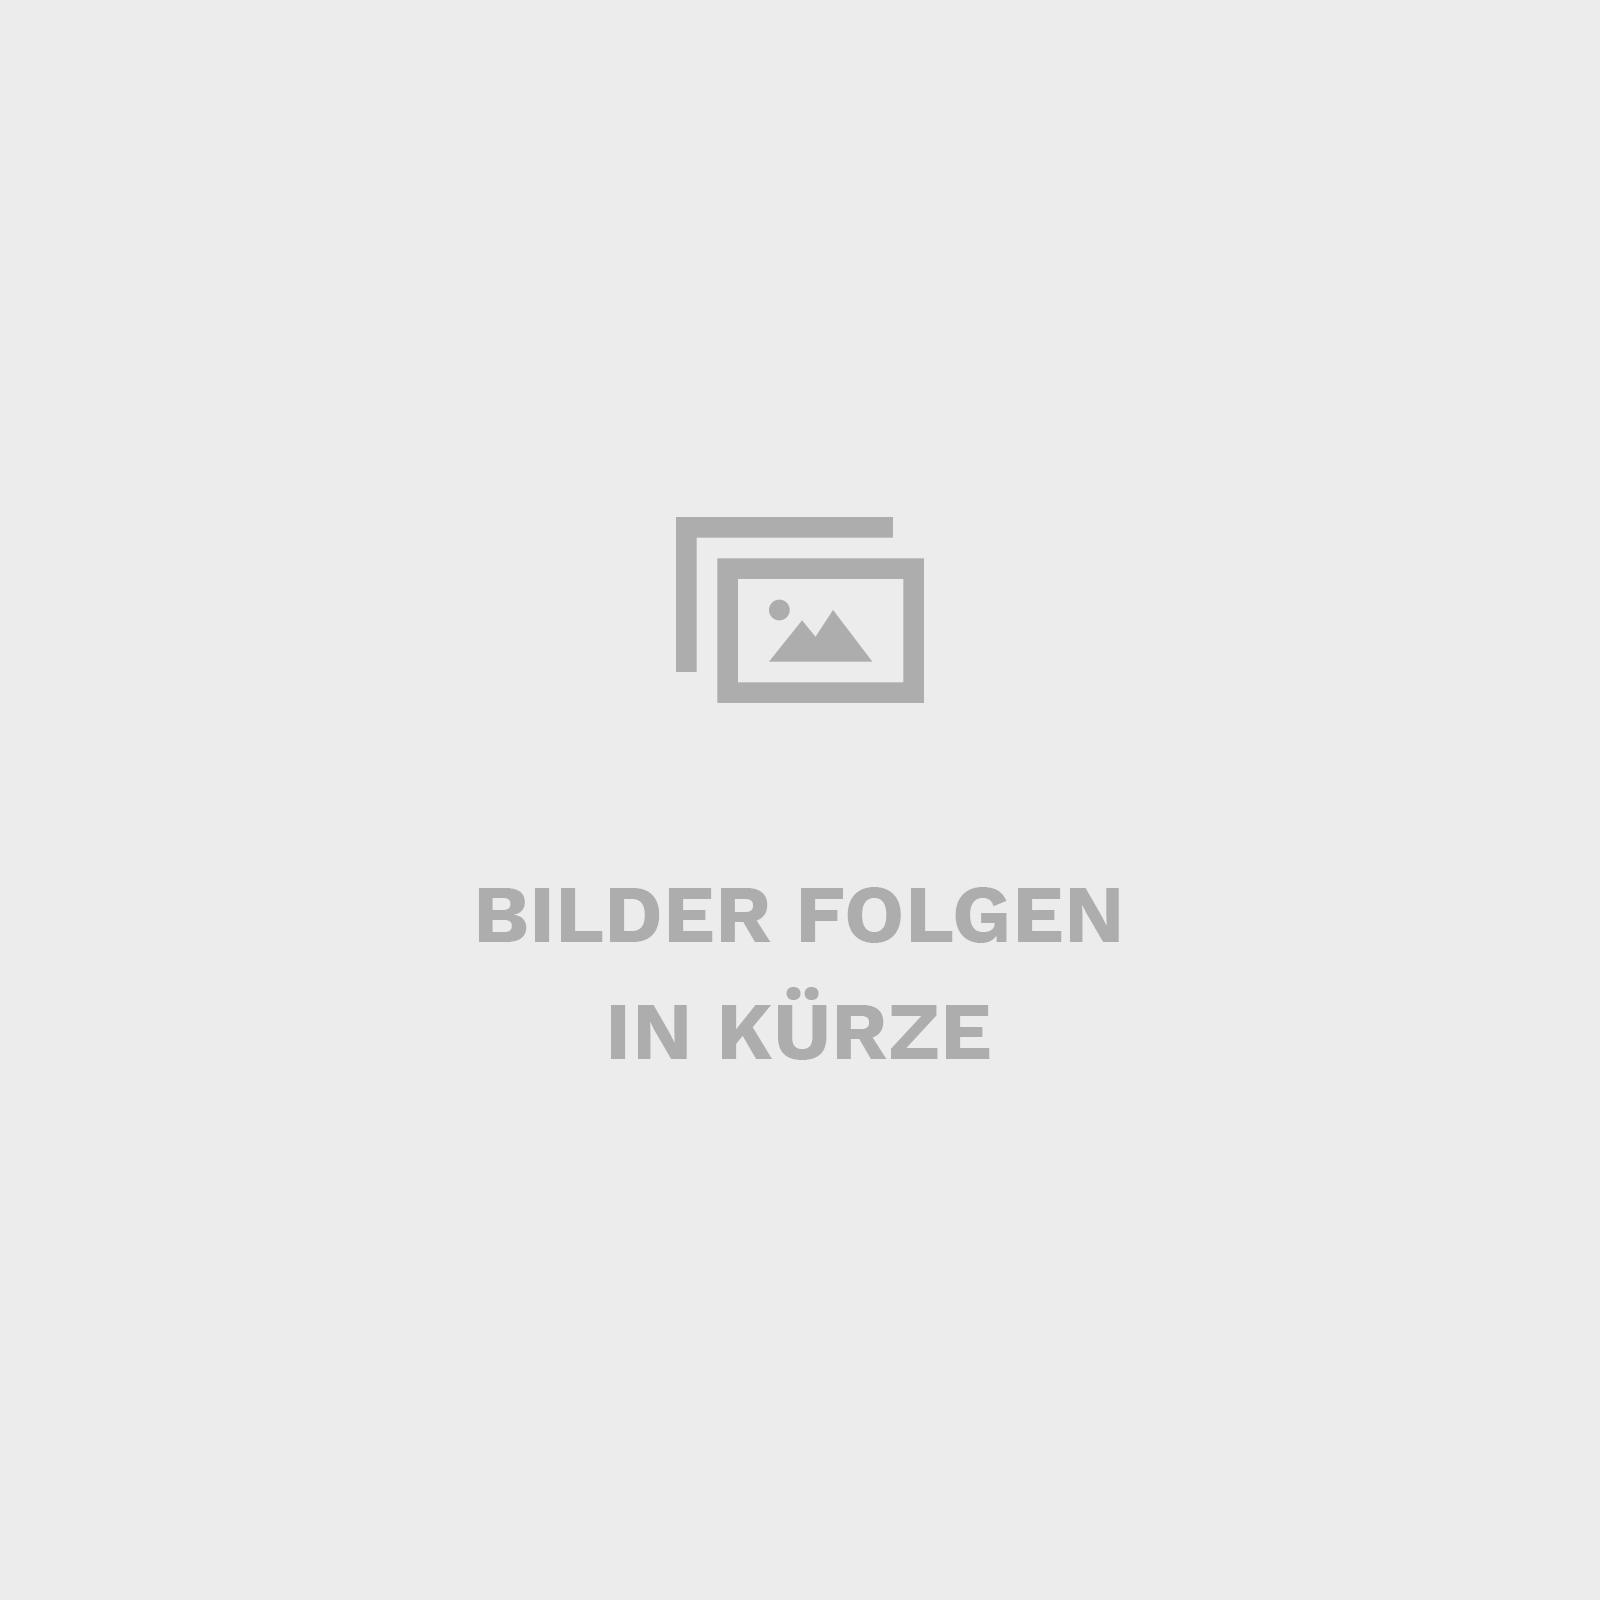 Bell Lamp - EU Label